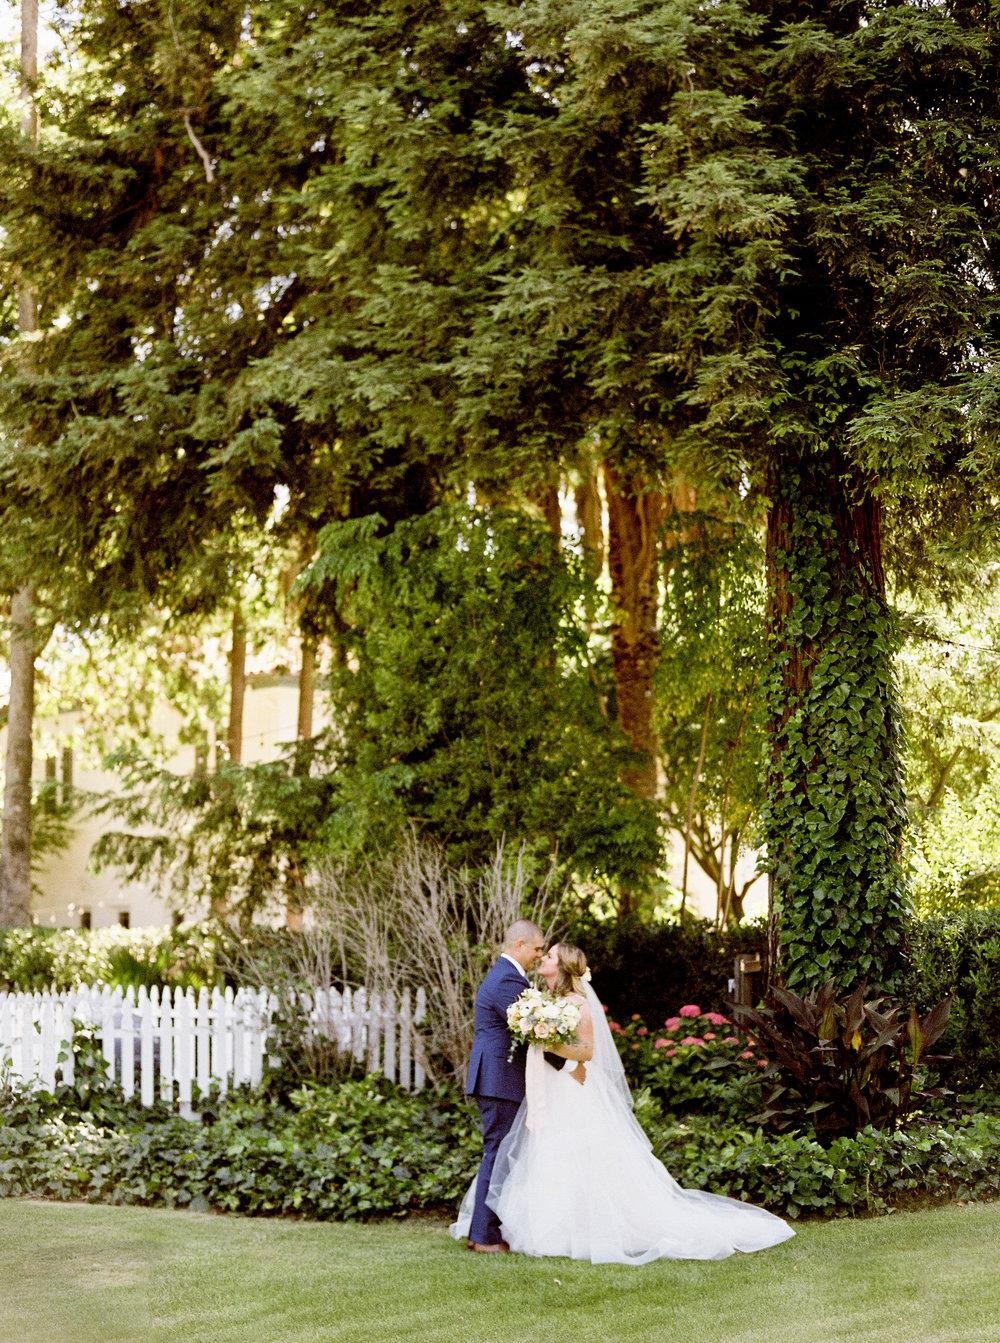 Durst-winery-wedding-in-lodi-calfornia-161.jpg